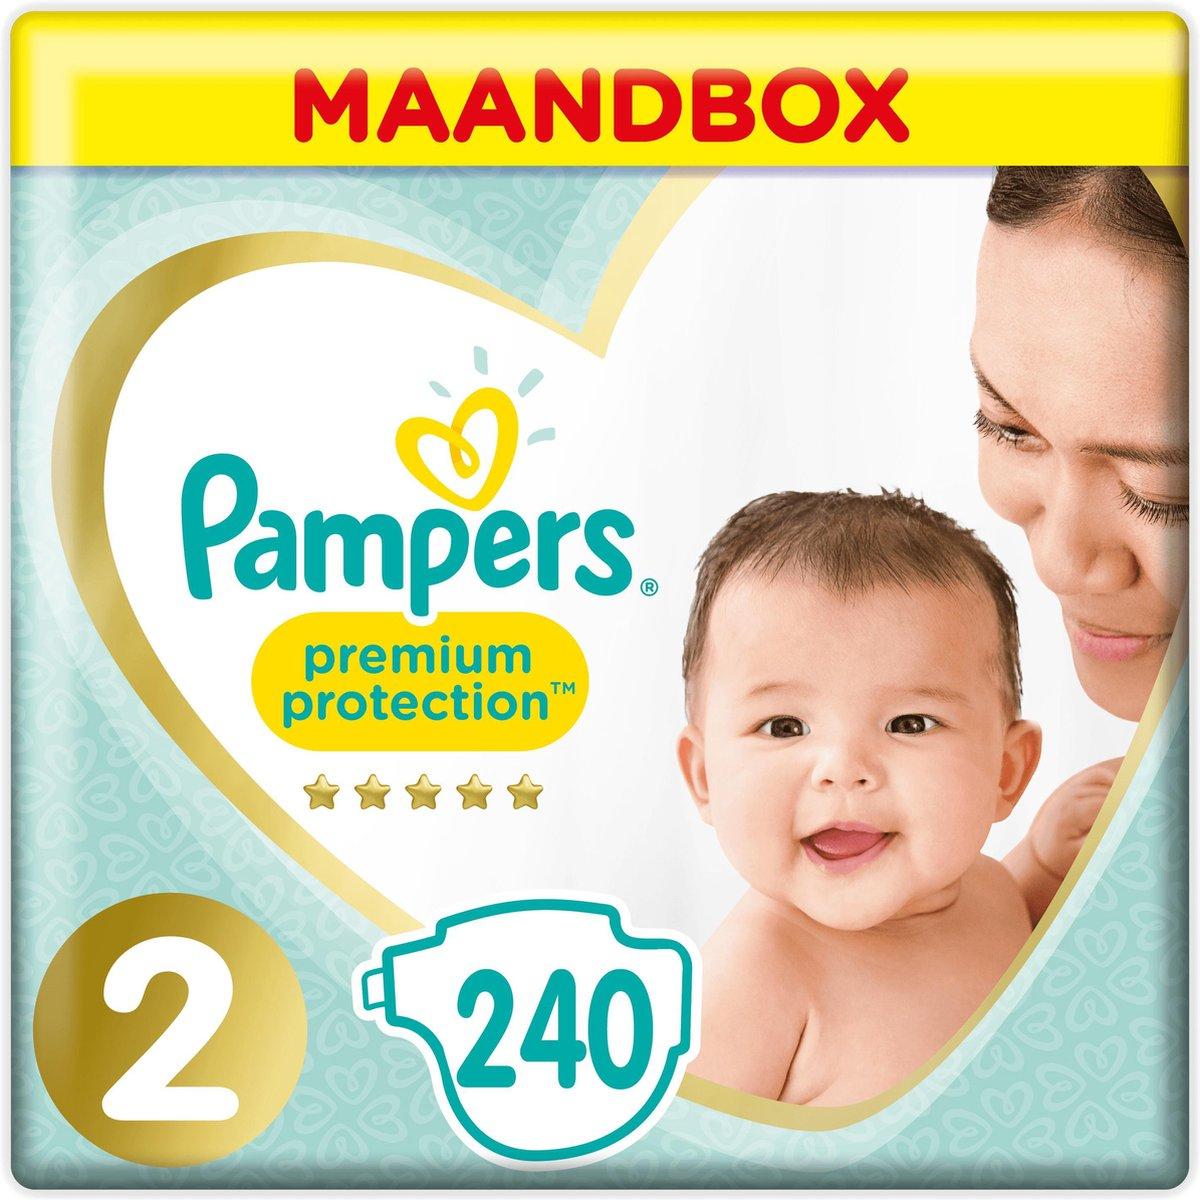 Pampers maandboxen bol.com